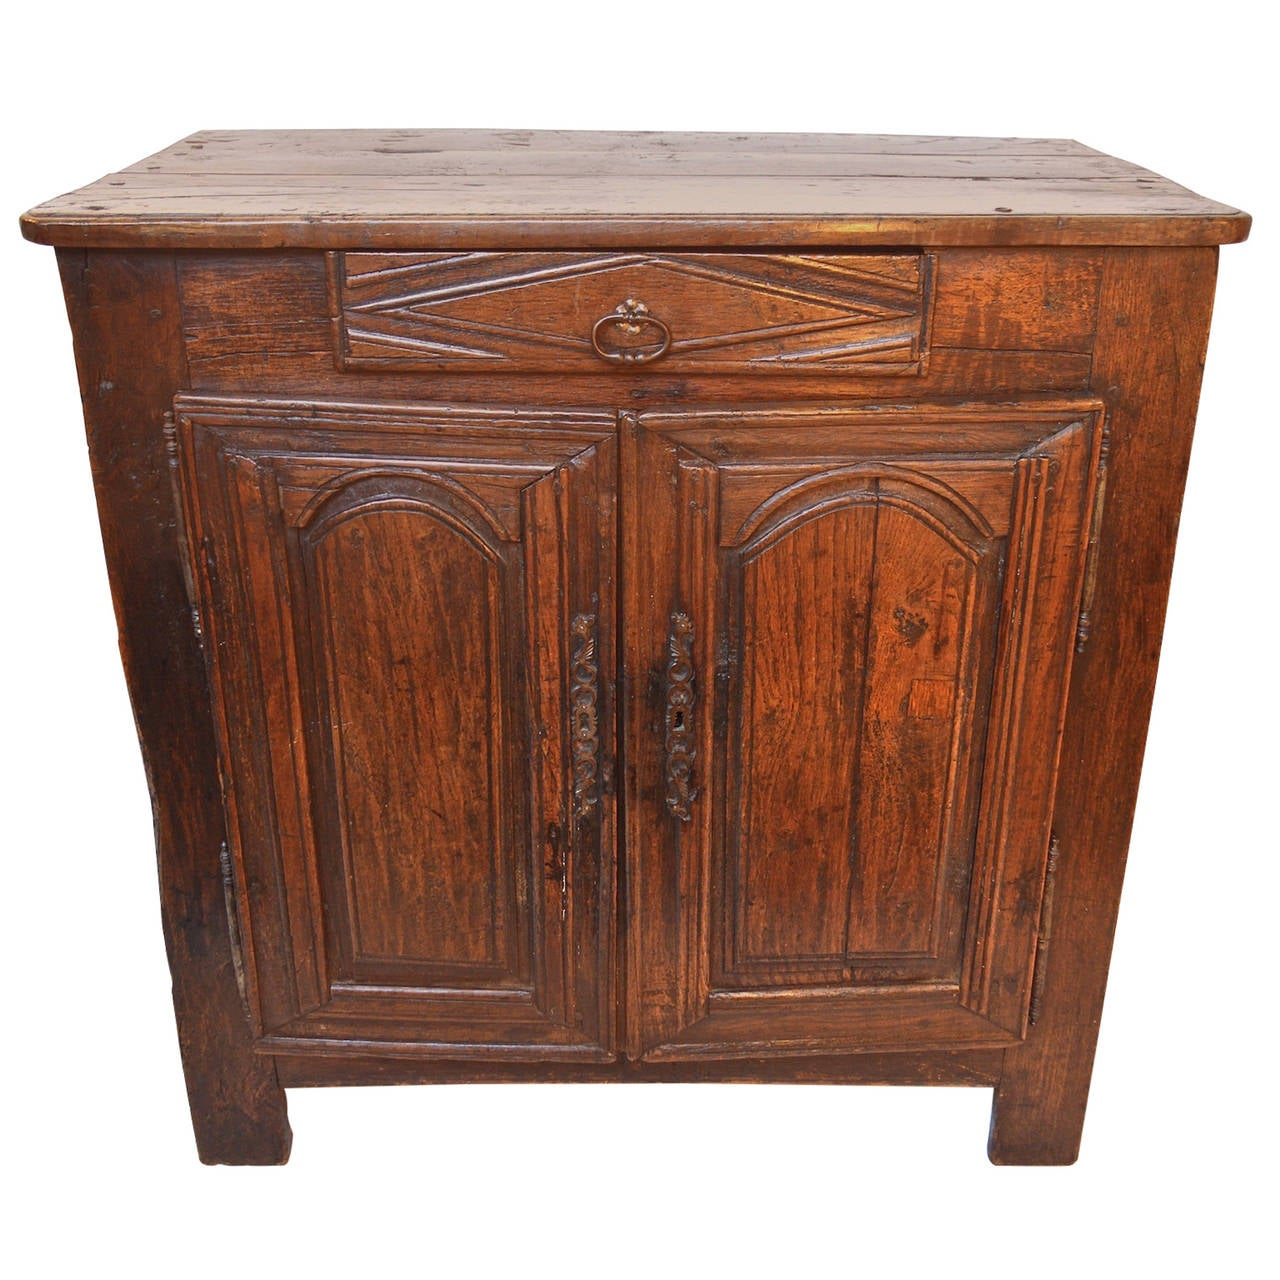 17th century petite buffet of oak at 1stdibs. Black Bedroom Furniture Sets. Home Design Ideas